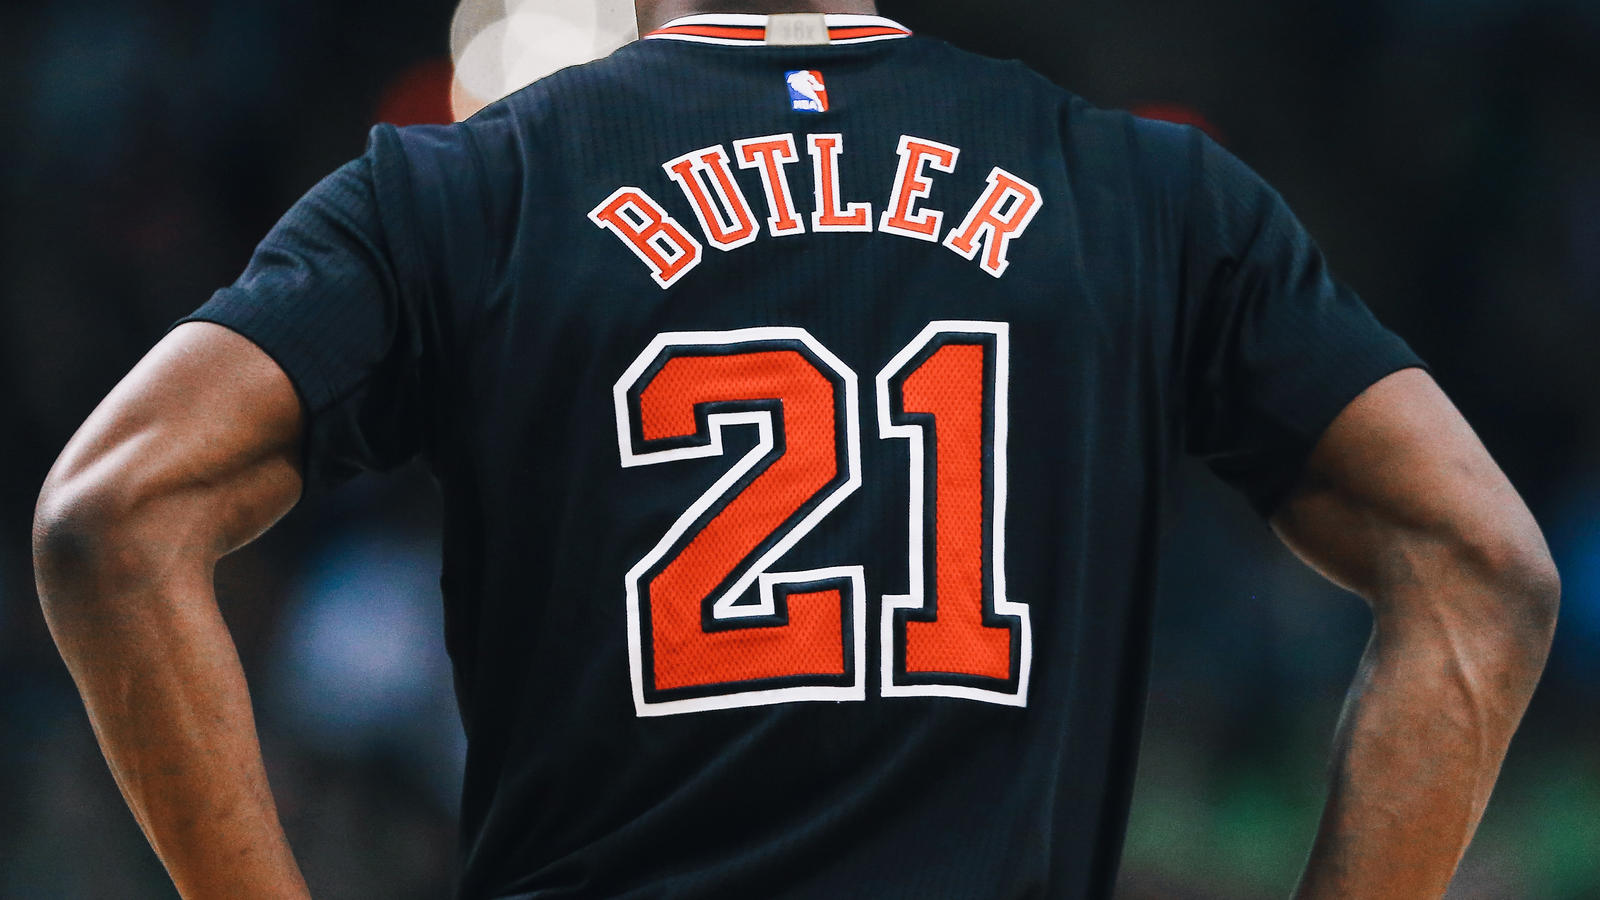 Jordan Brand Athlete Jimmy Butler